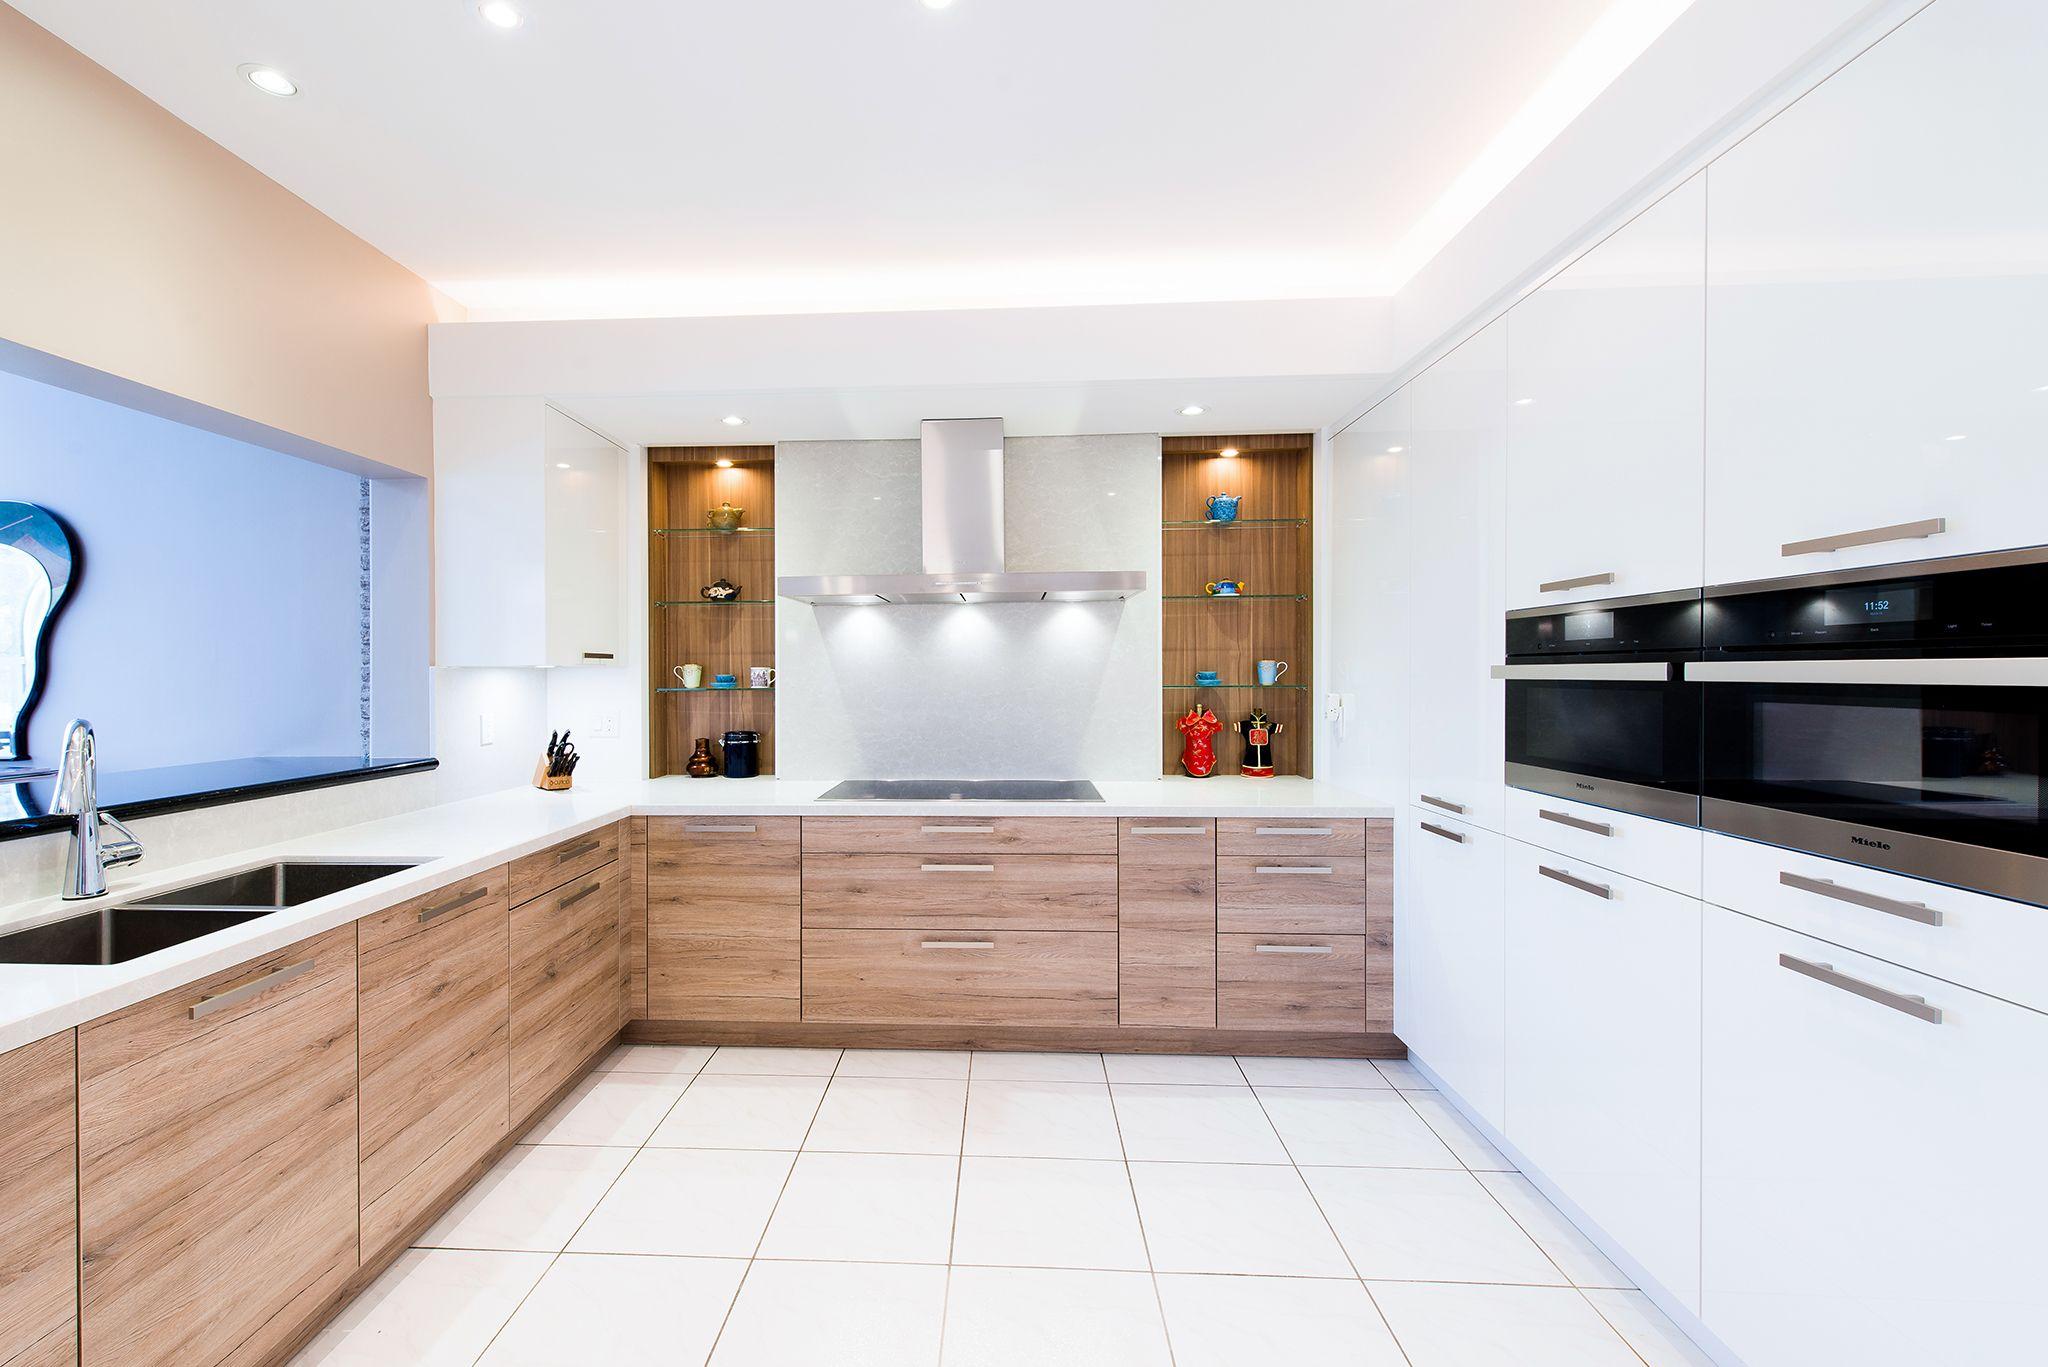 Uncategorized Toronto Kitchen Design global kitchen design worldwide leicht in toronto toronto